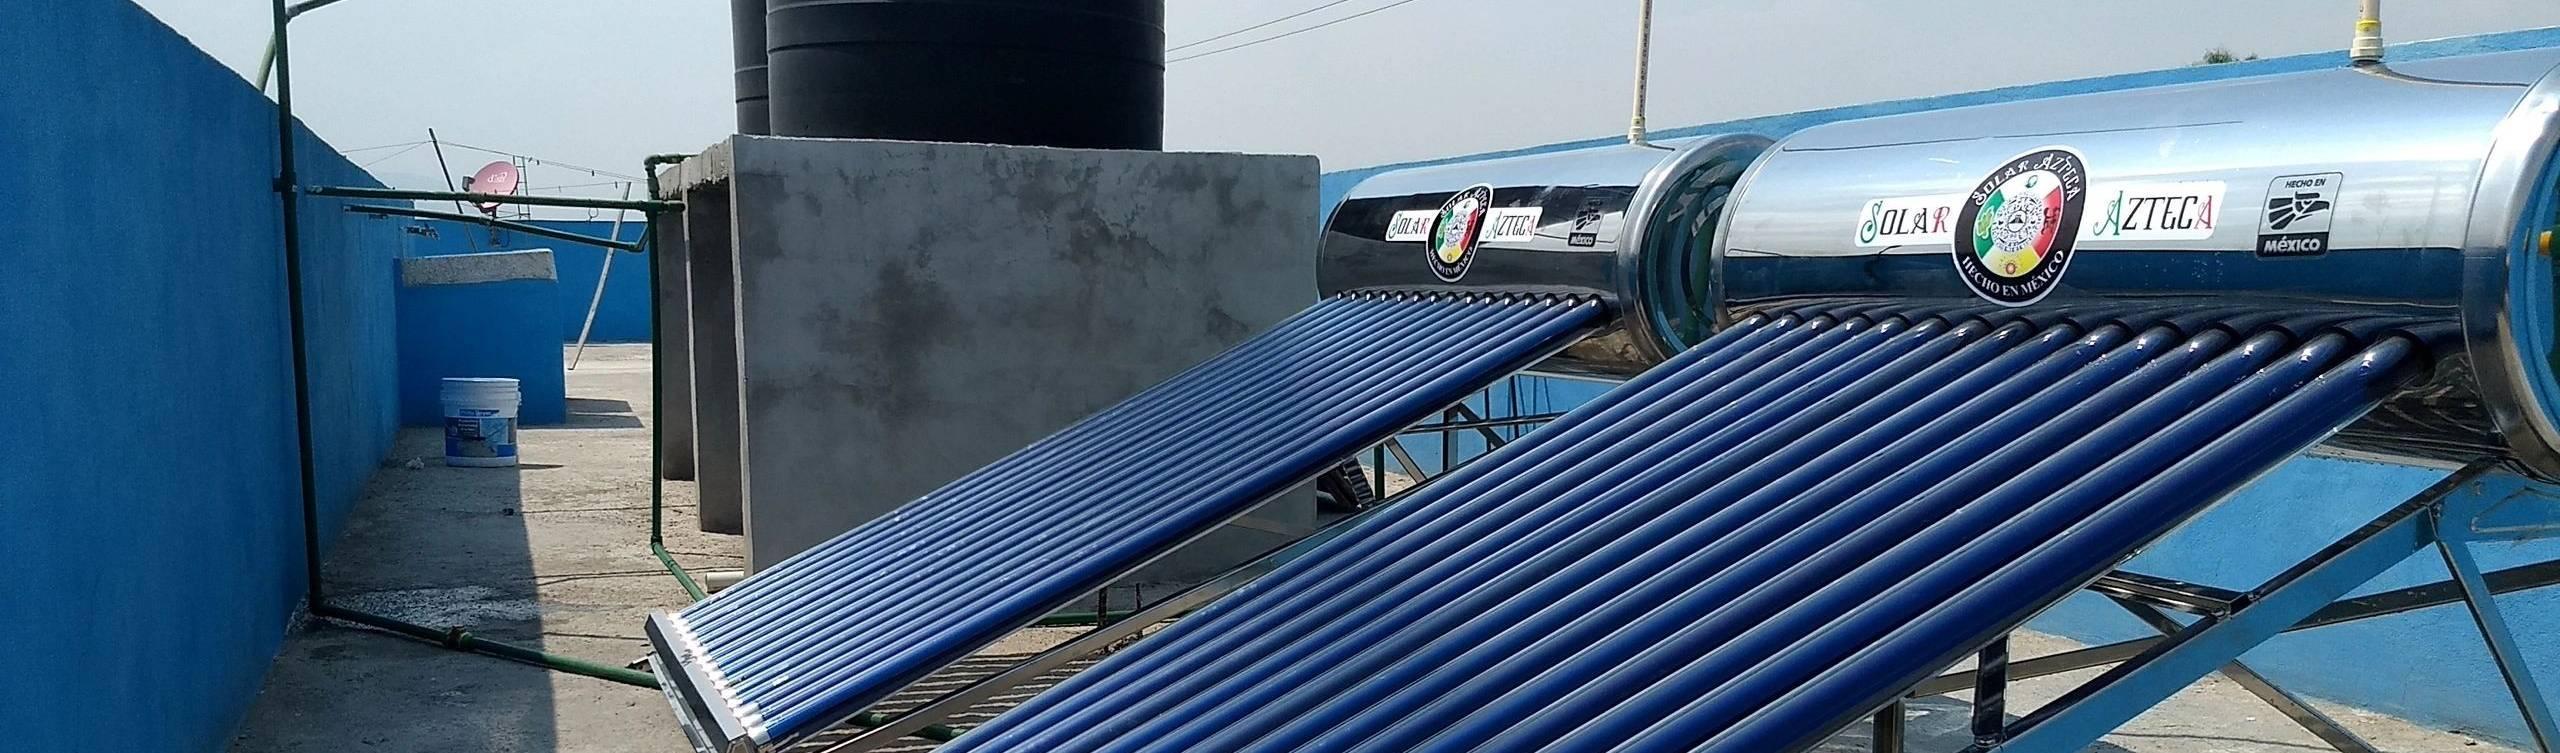 Solar Azteca